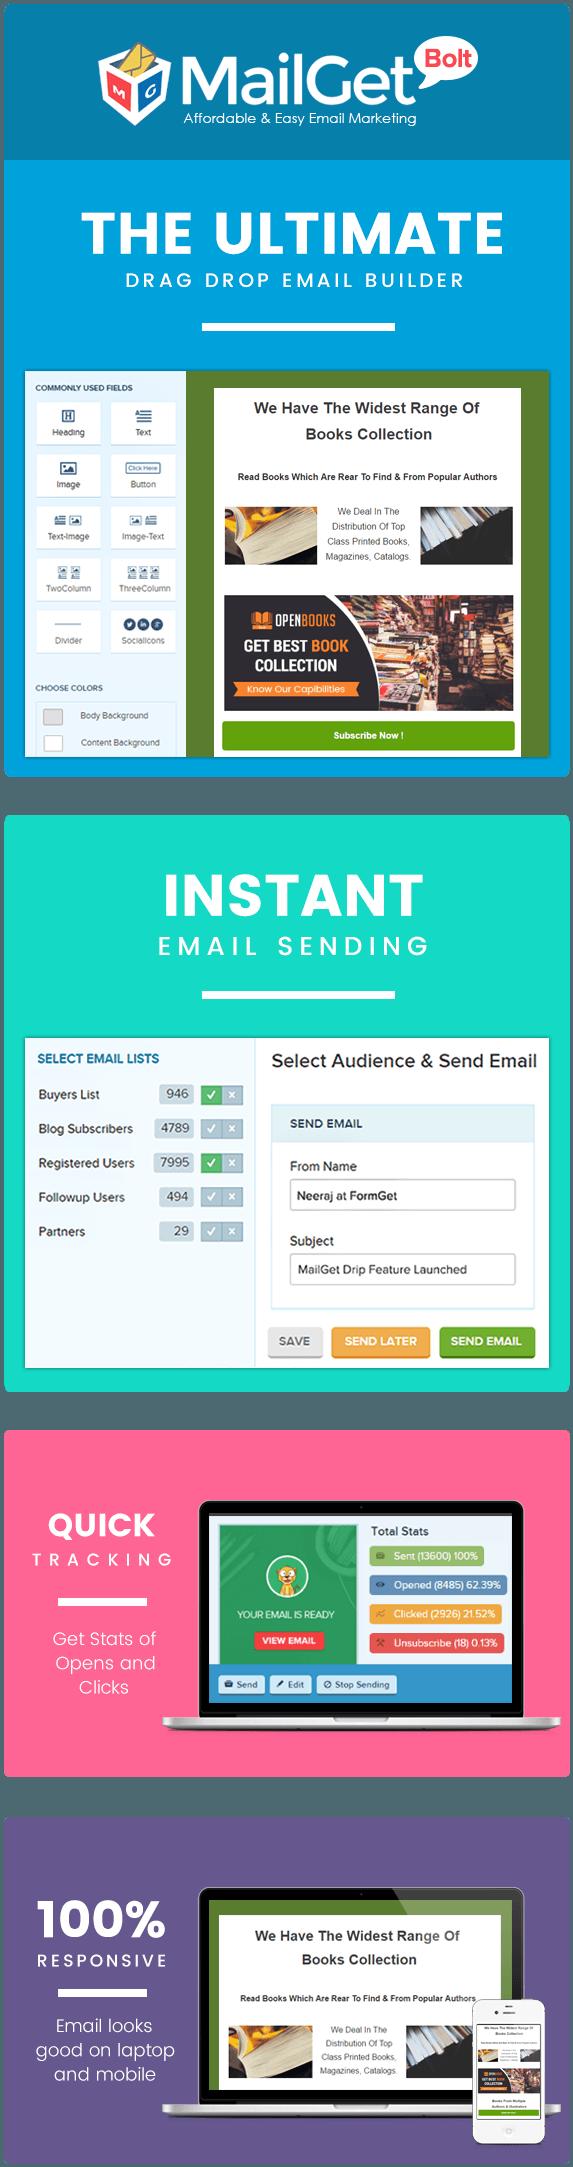 MailGet Bolt - Email Marketing For Book Distributors